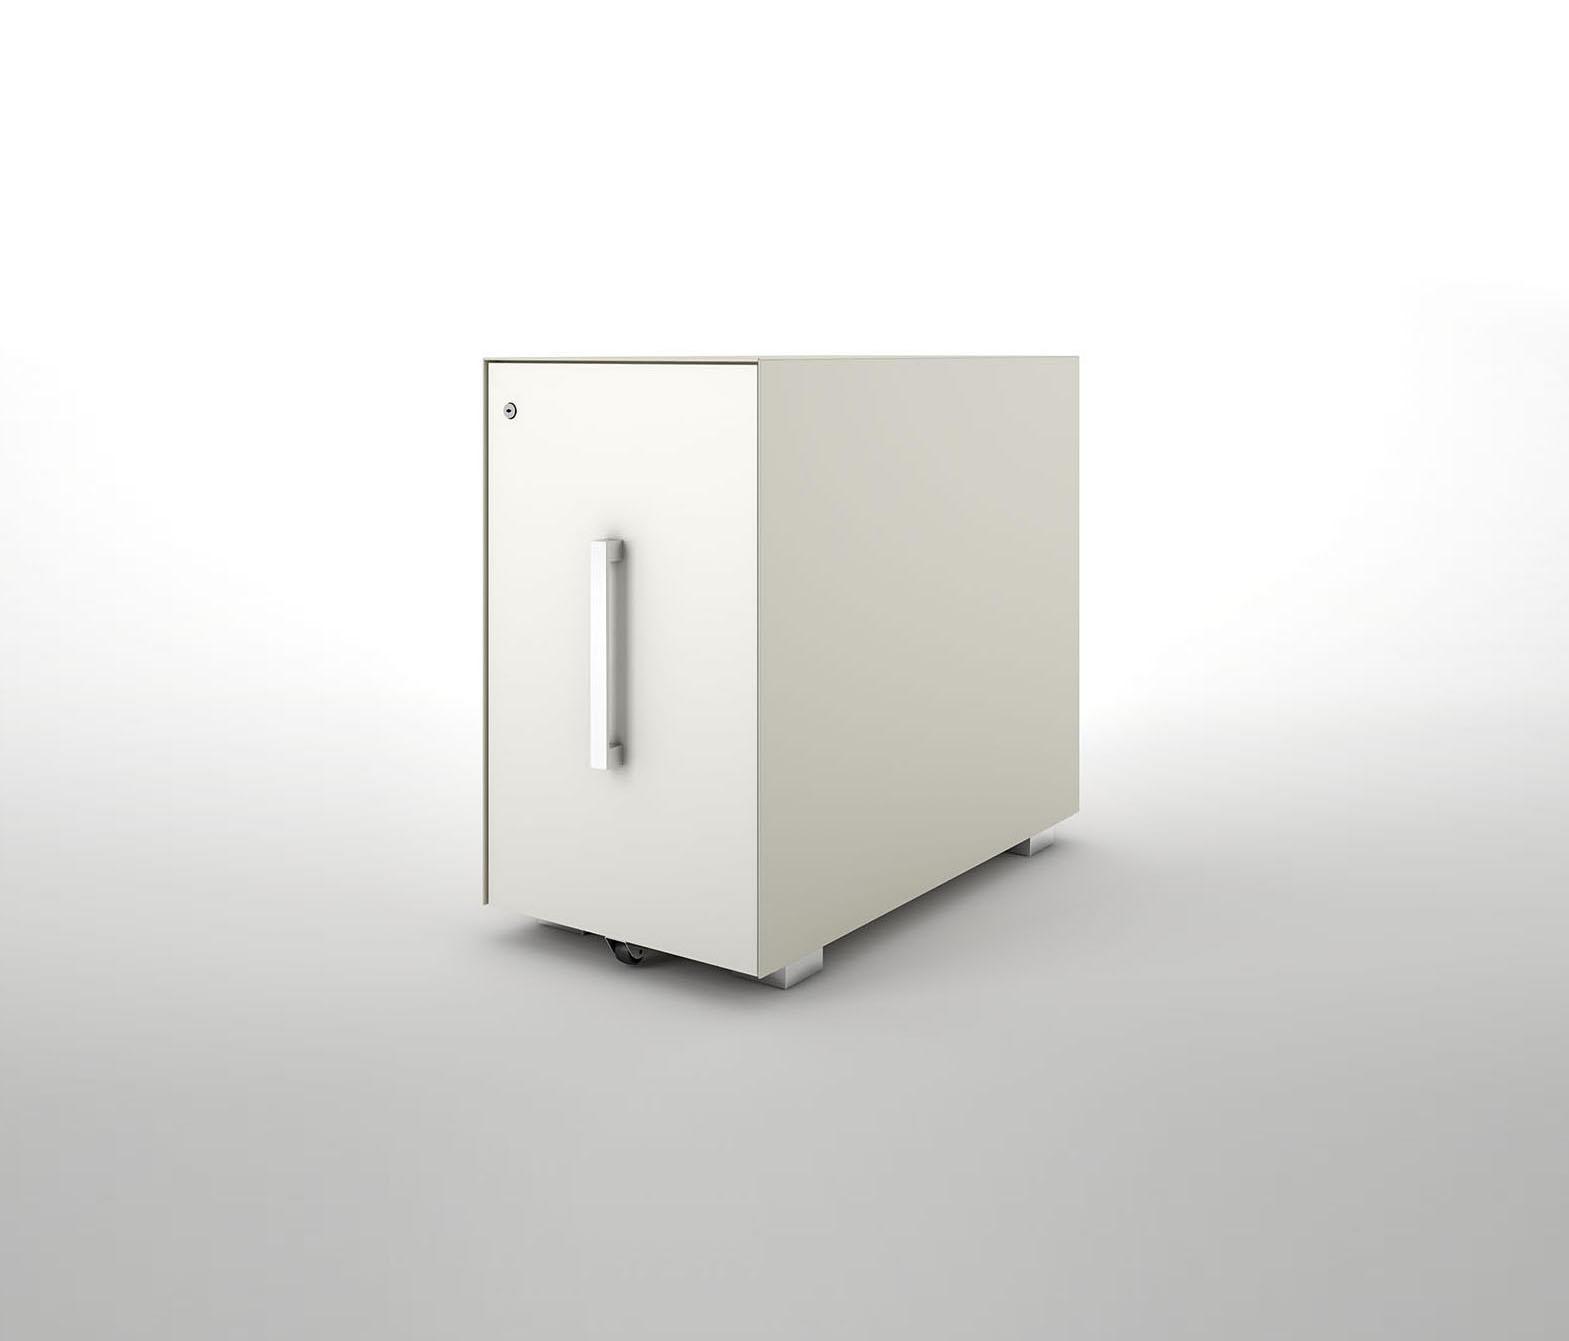 VERTICAL FILE | H710 - Pedestals from Dieffebi | Architonic